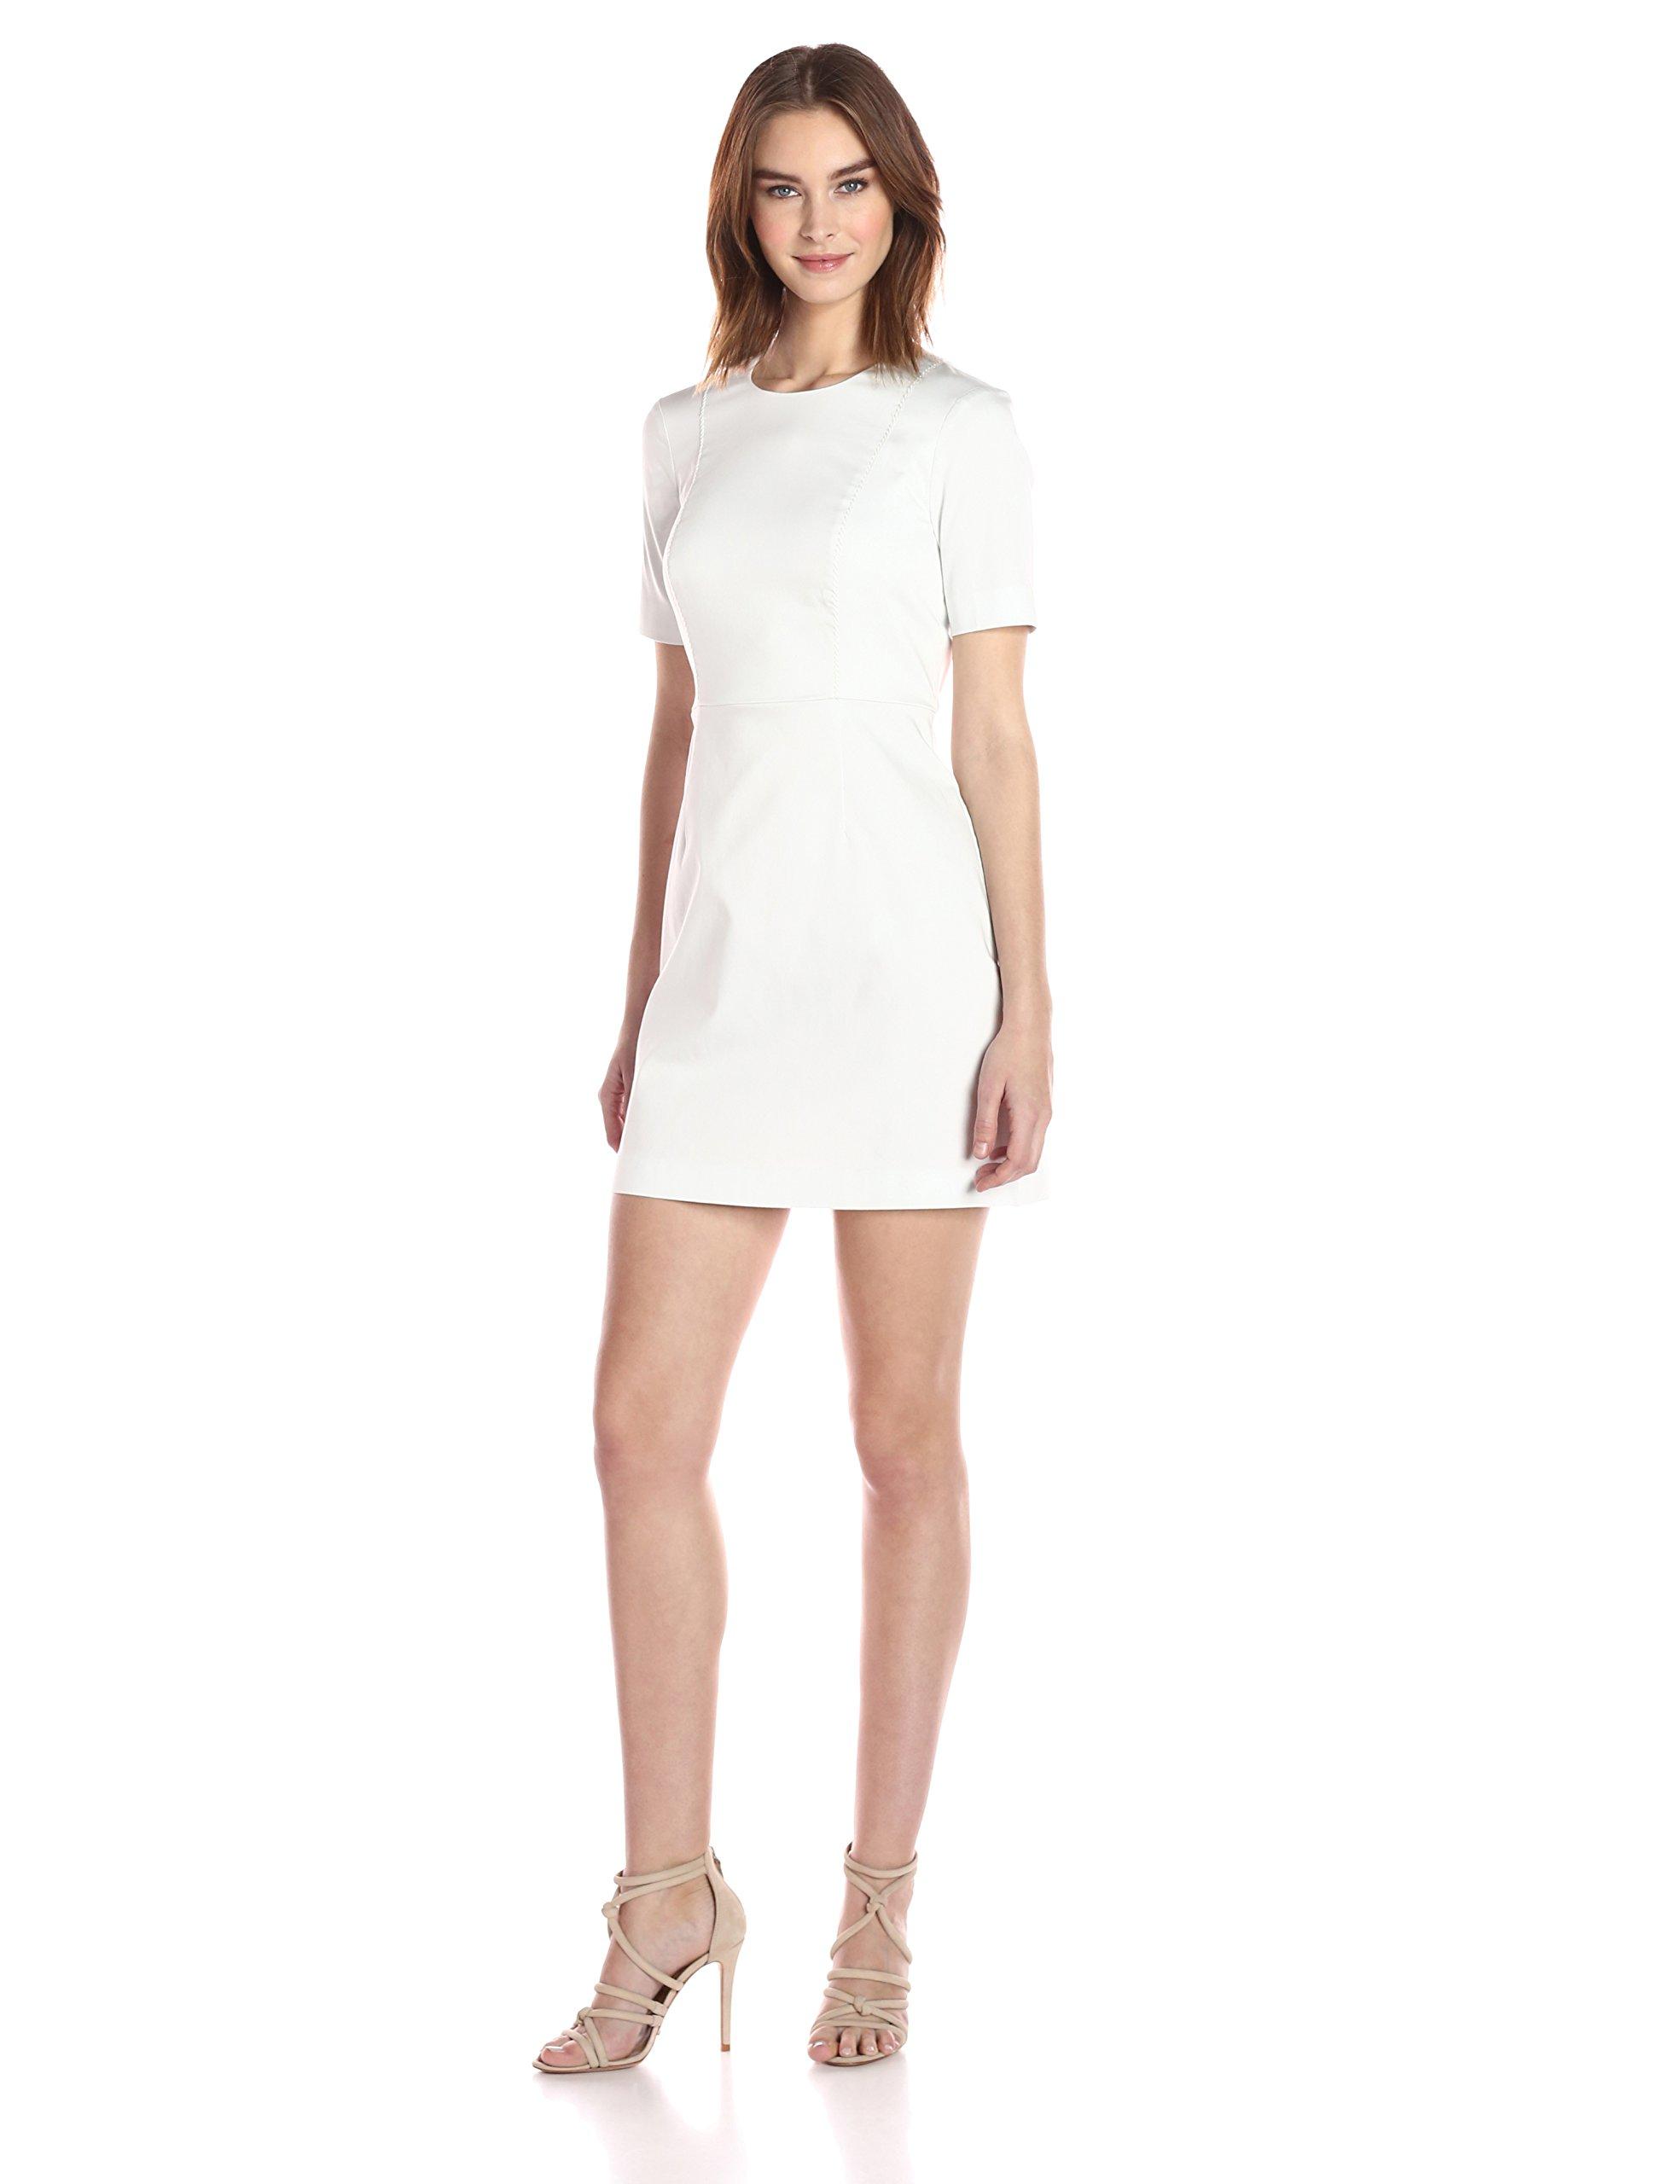 French Connection Women's Modern Kantha Cotton Dress, Summer White, 6